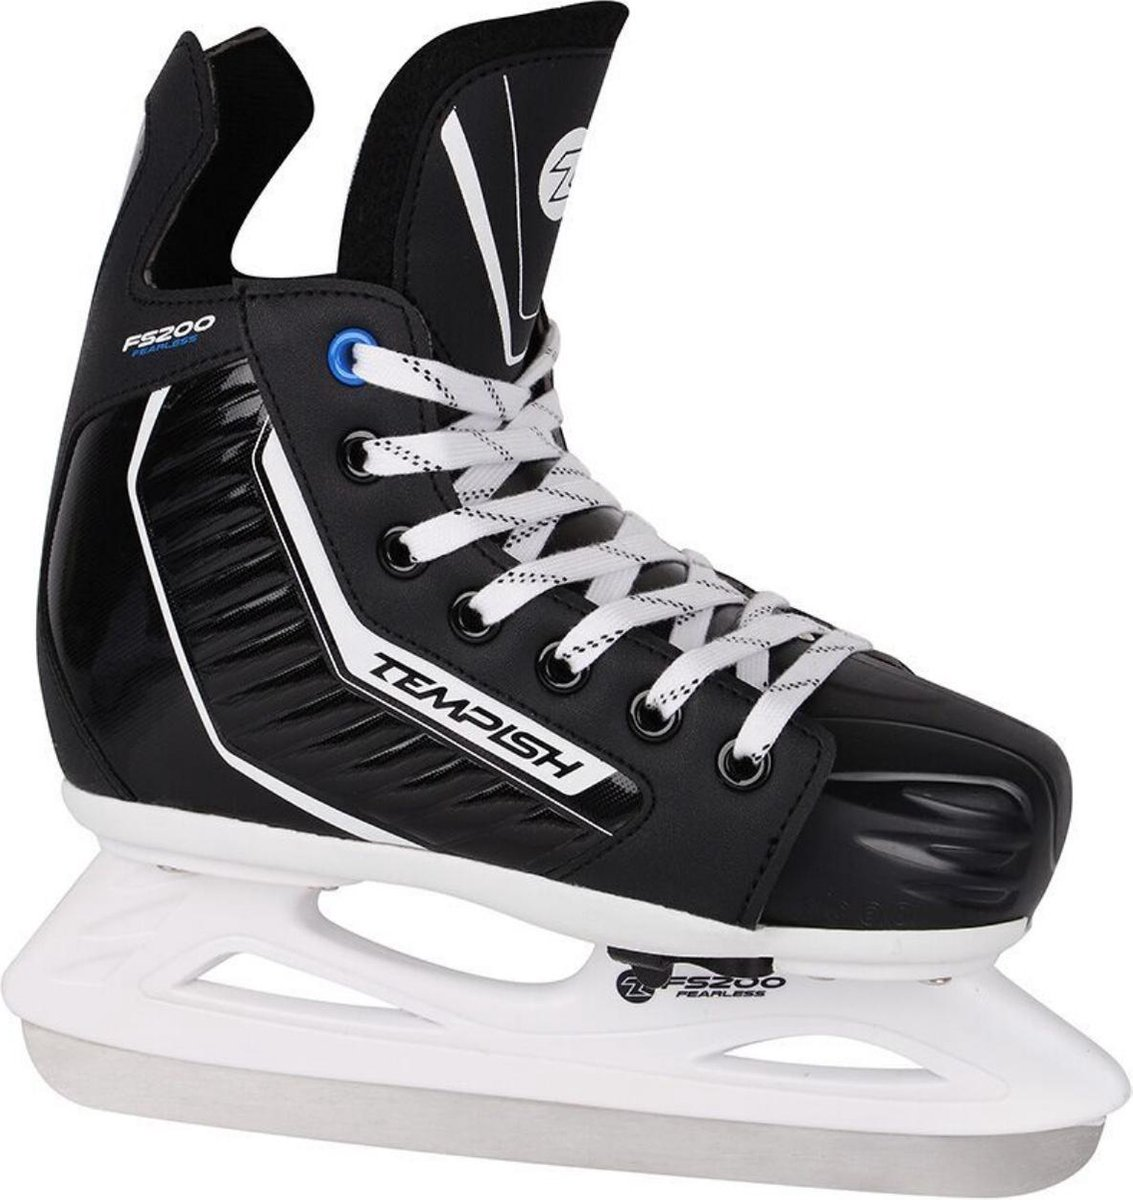 Tempish IJshockeyschaatsen verstelbaar FS200 Zwart 36-40